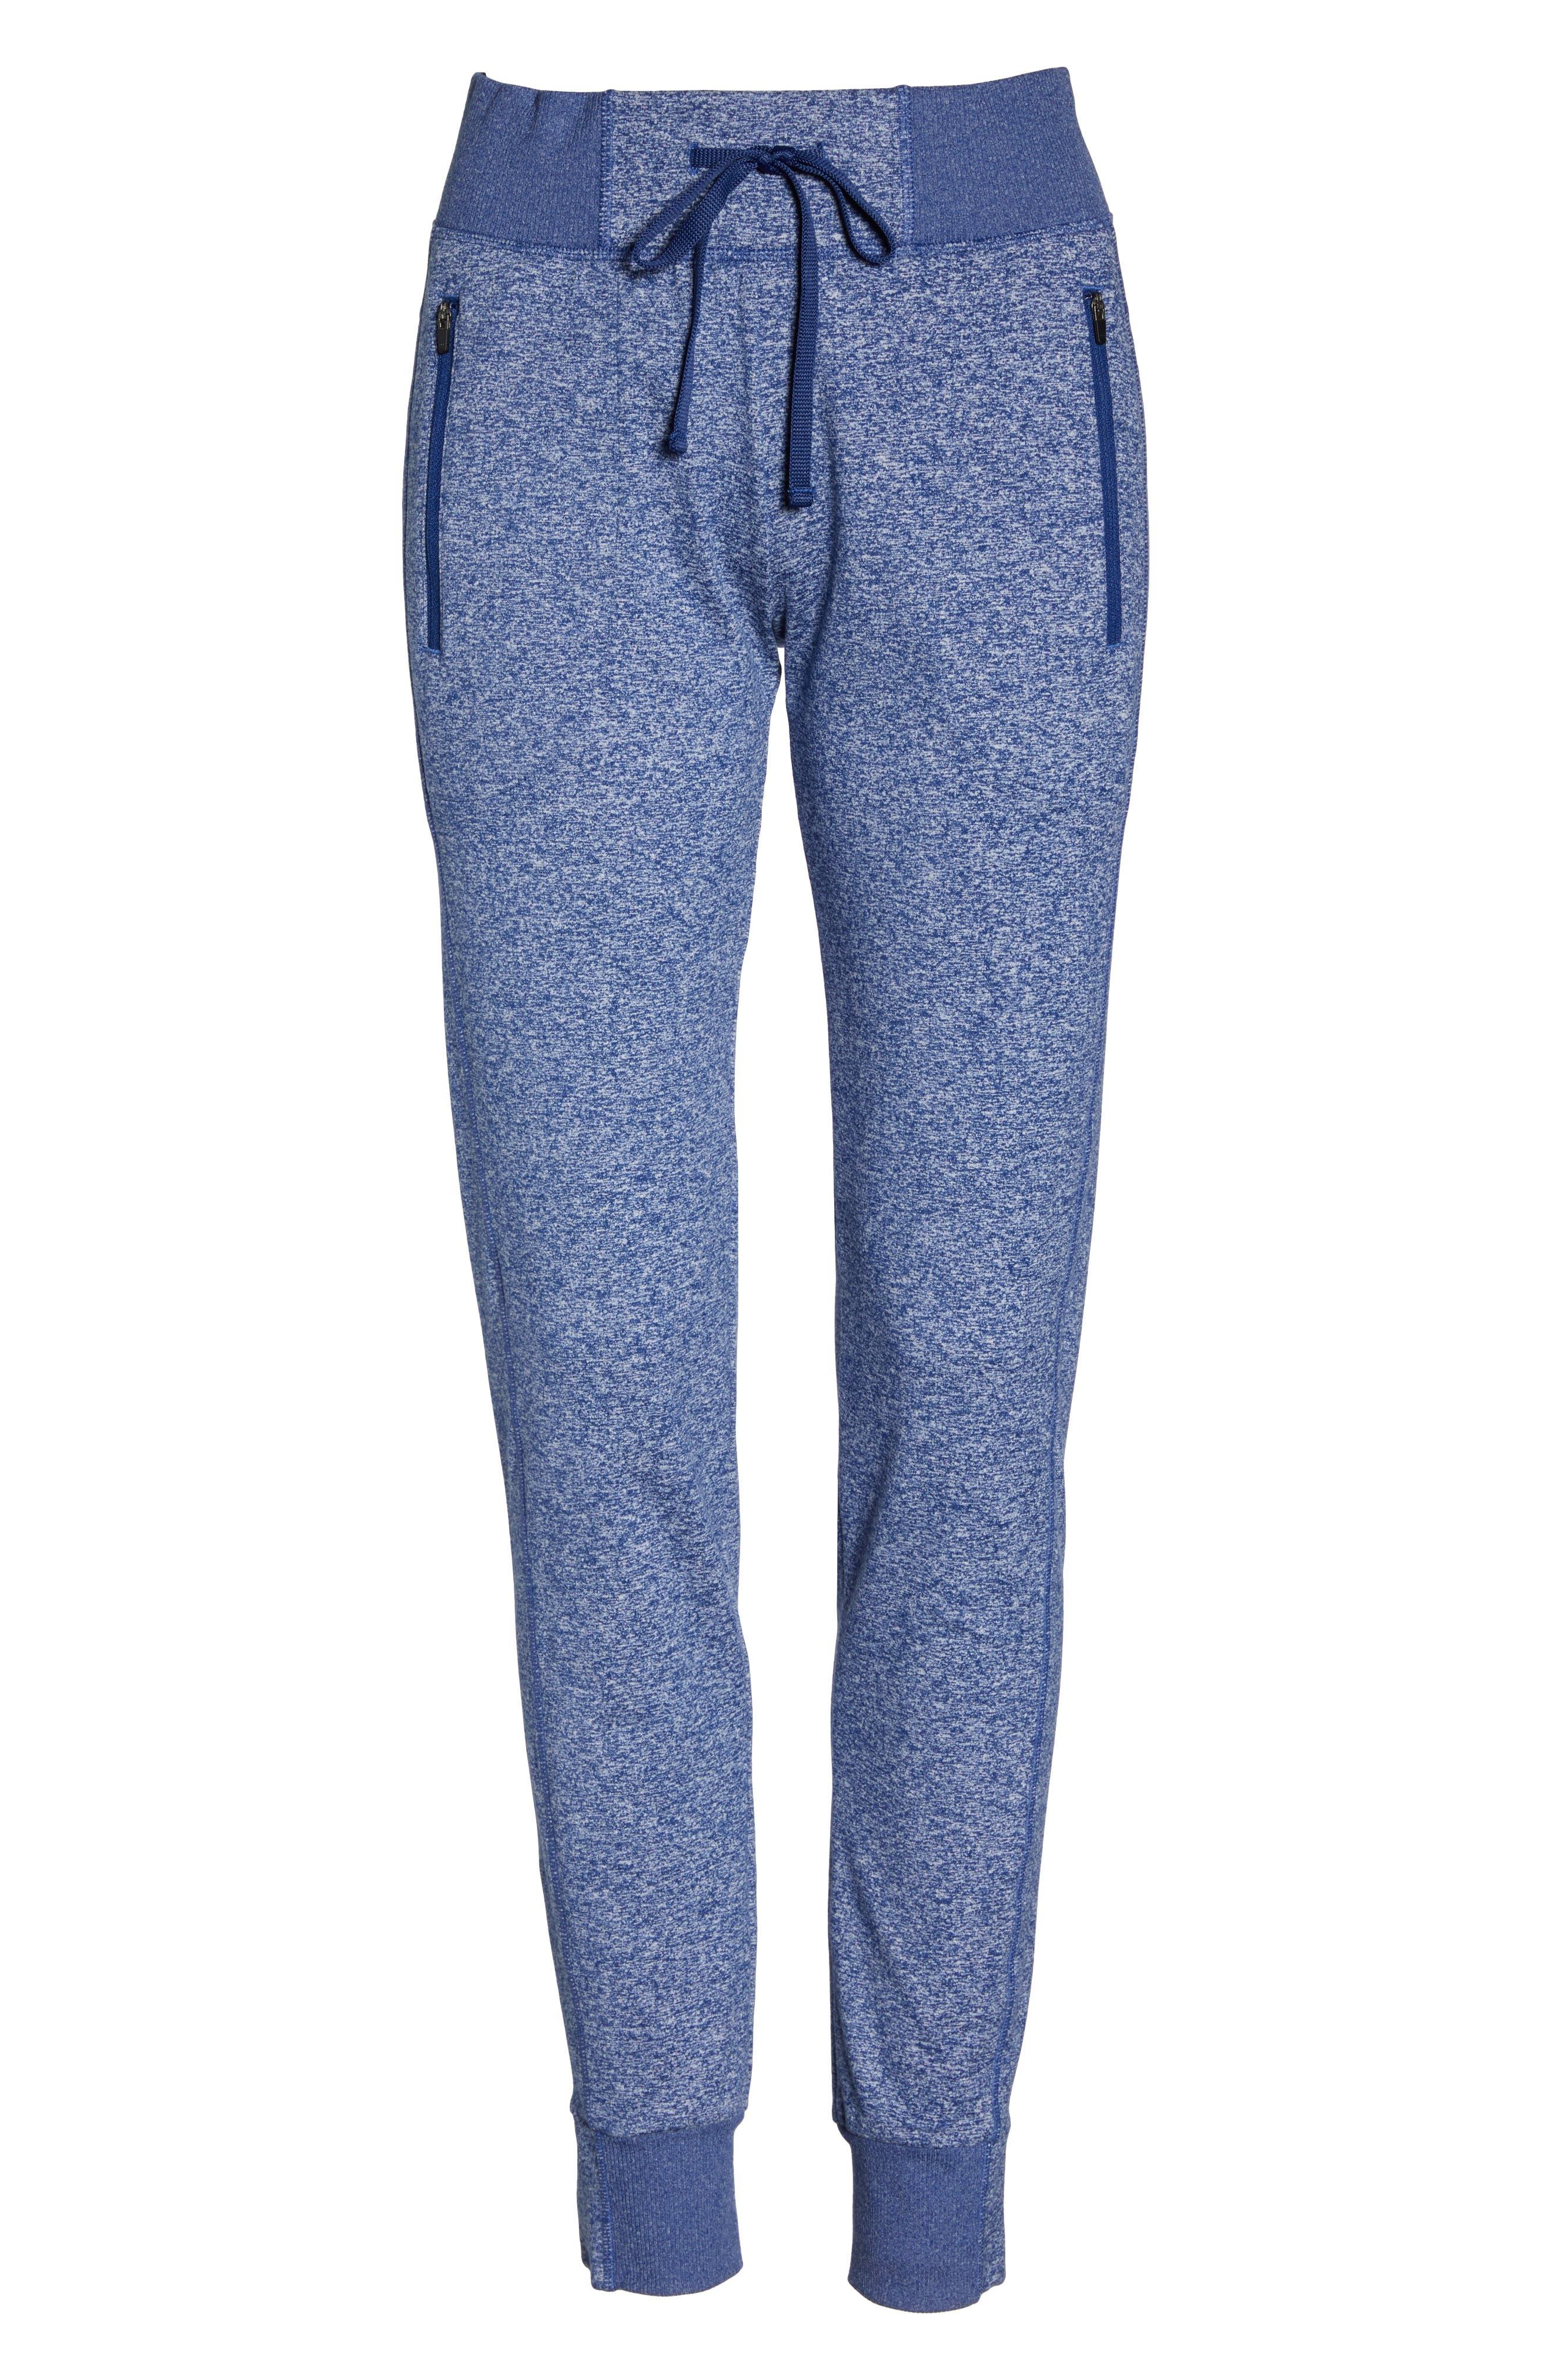 Taryn Sport Knit Pants,                             Alternate thumbnail 25, color,